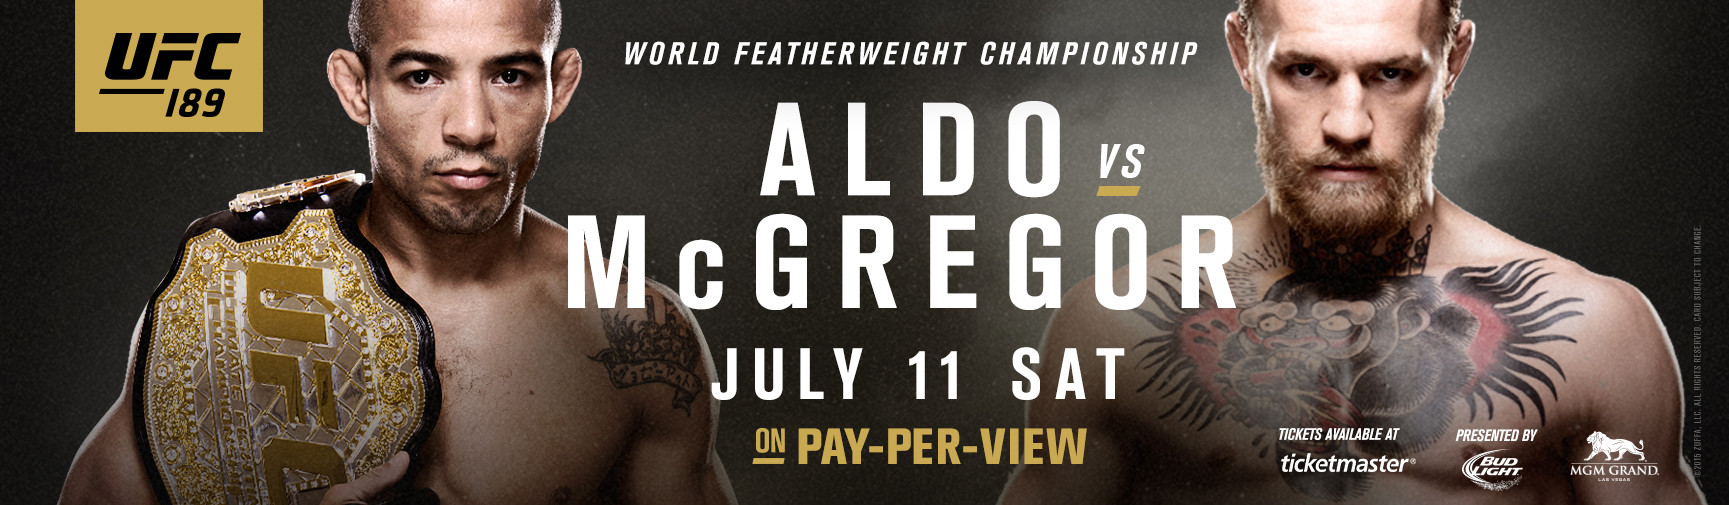 UFC_PPV_189_Billboard.jpg